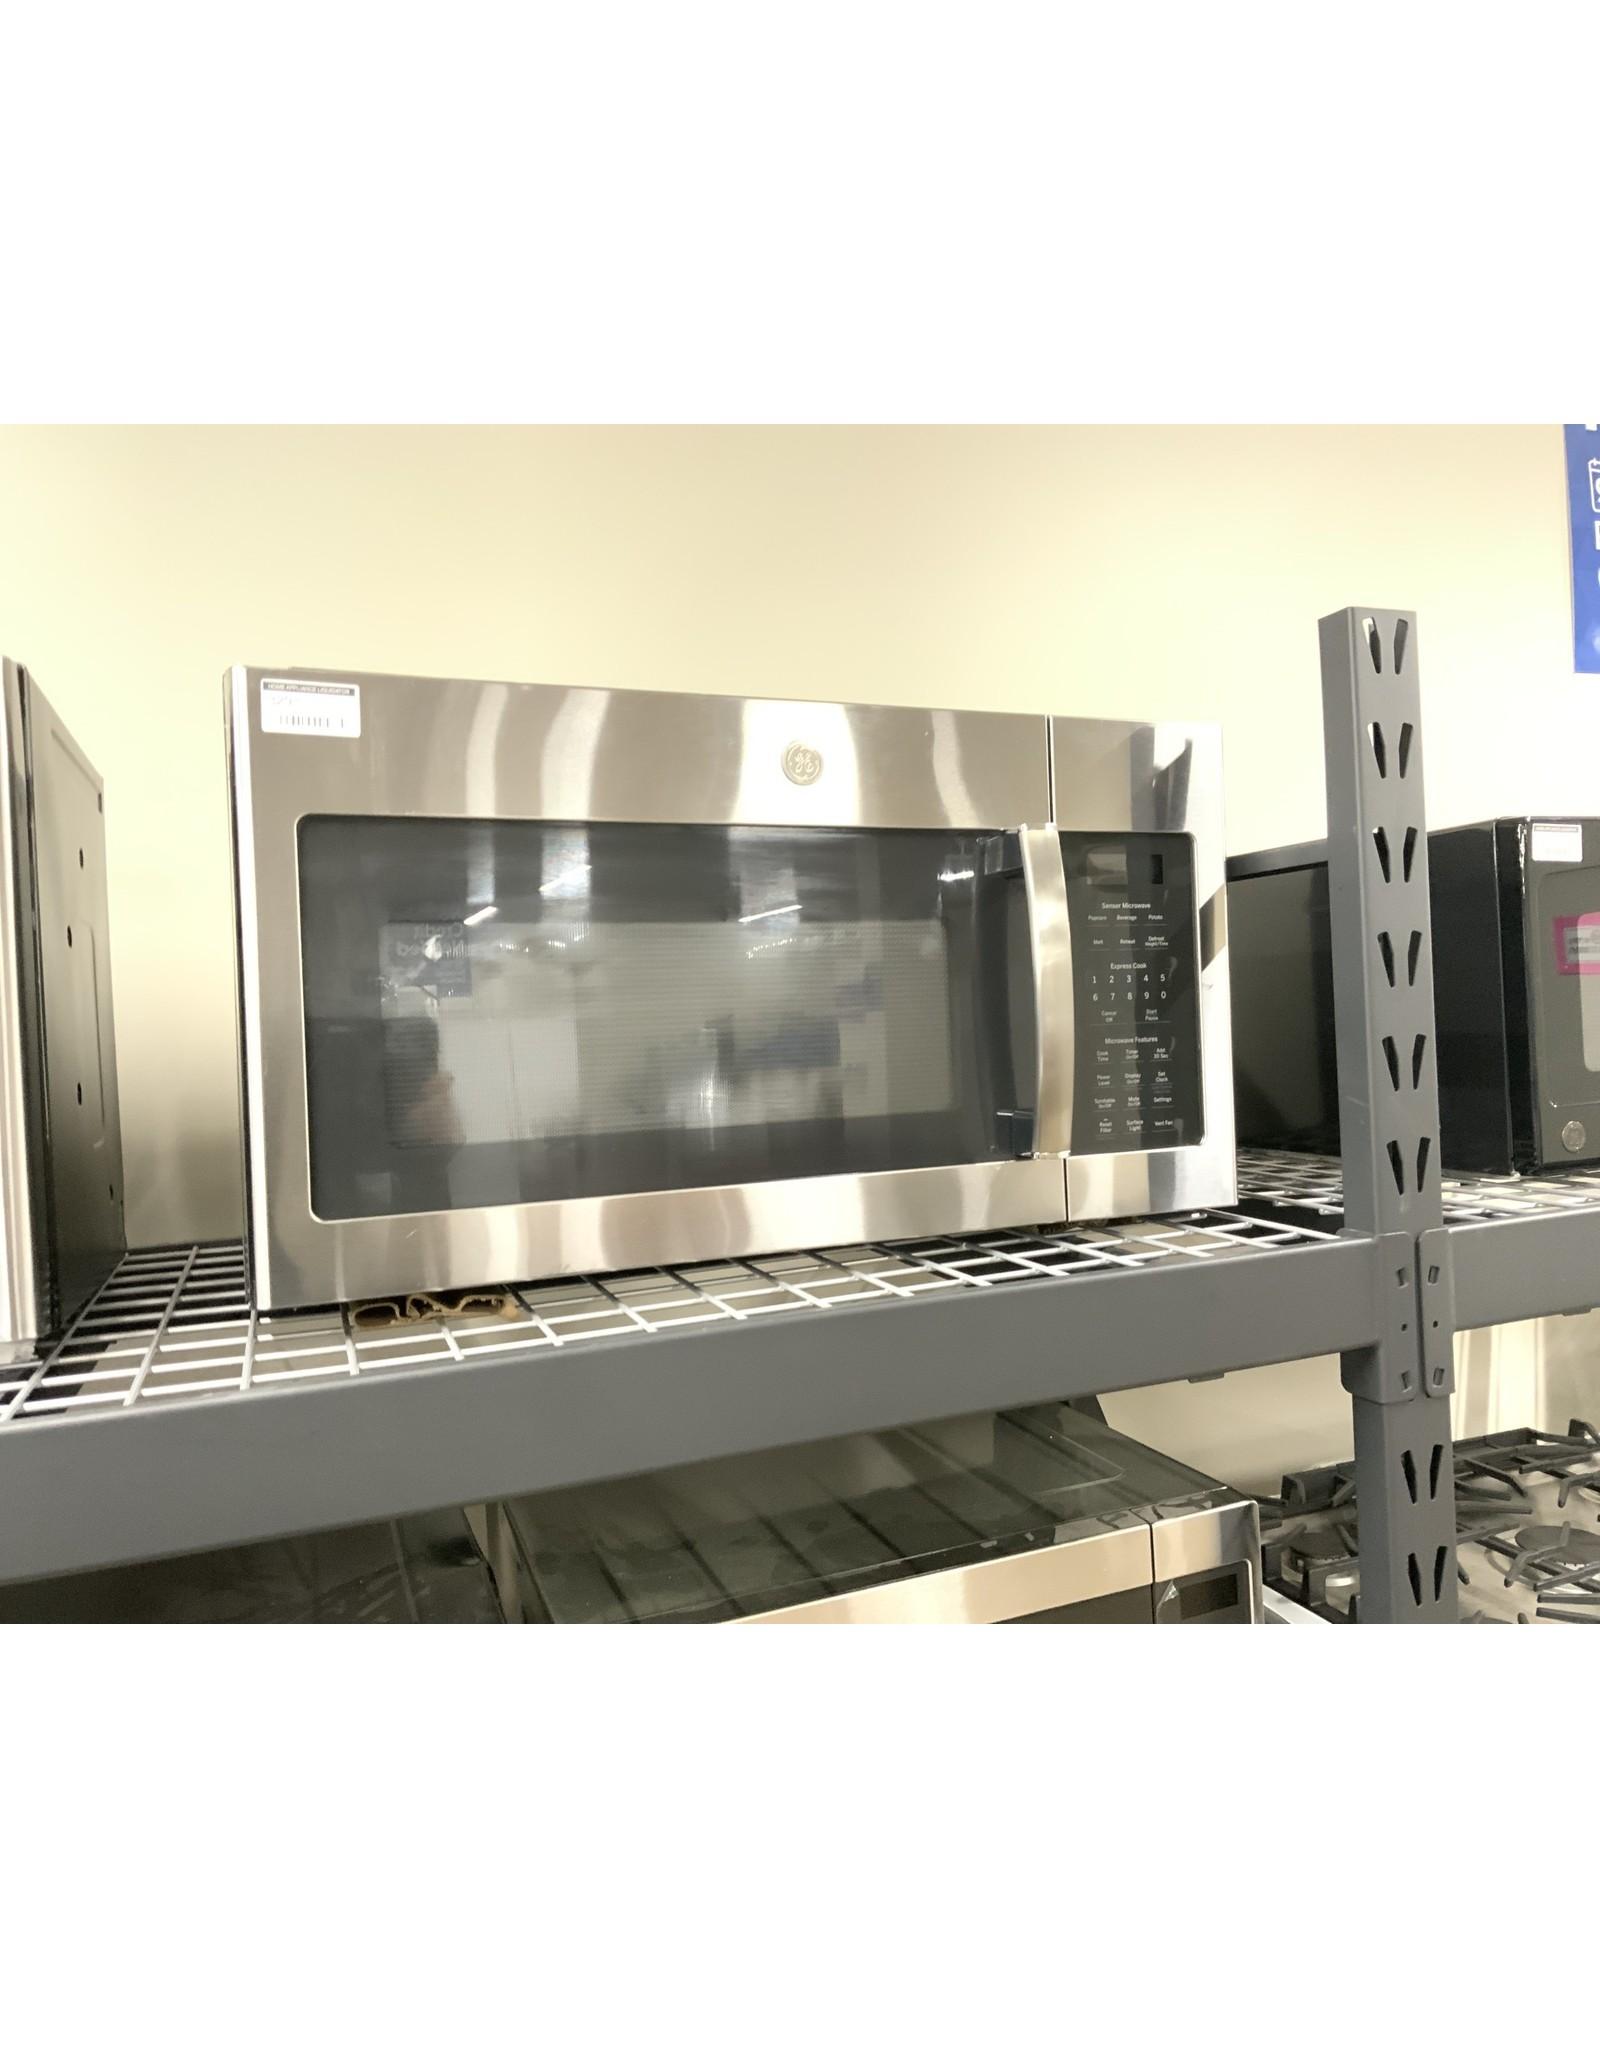 GE GE 1.7 Cu. Ft. Over-the-Range Sensor Microwave Oven